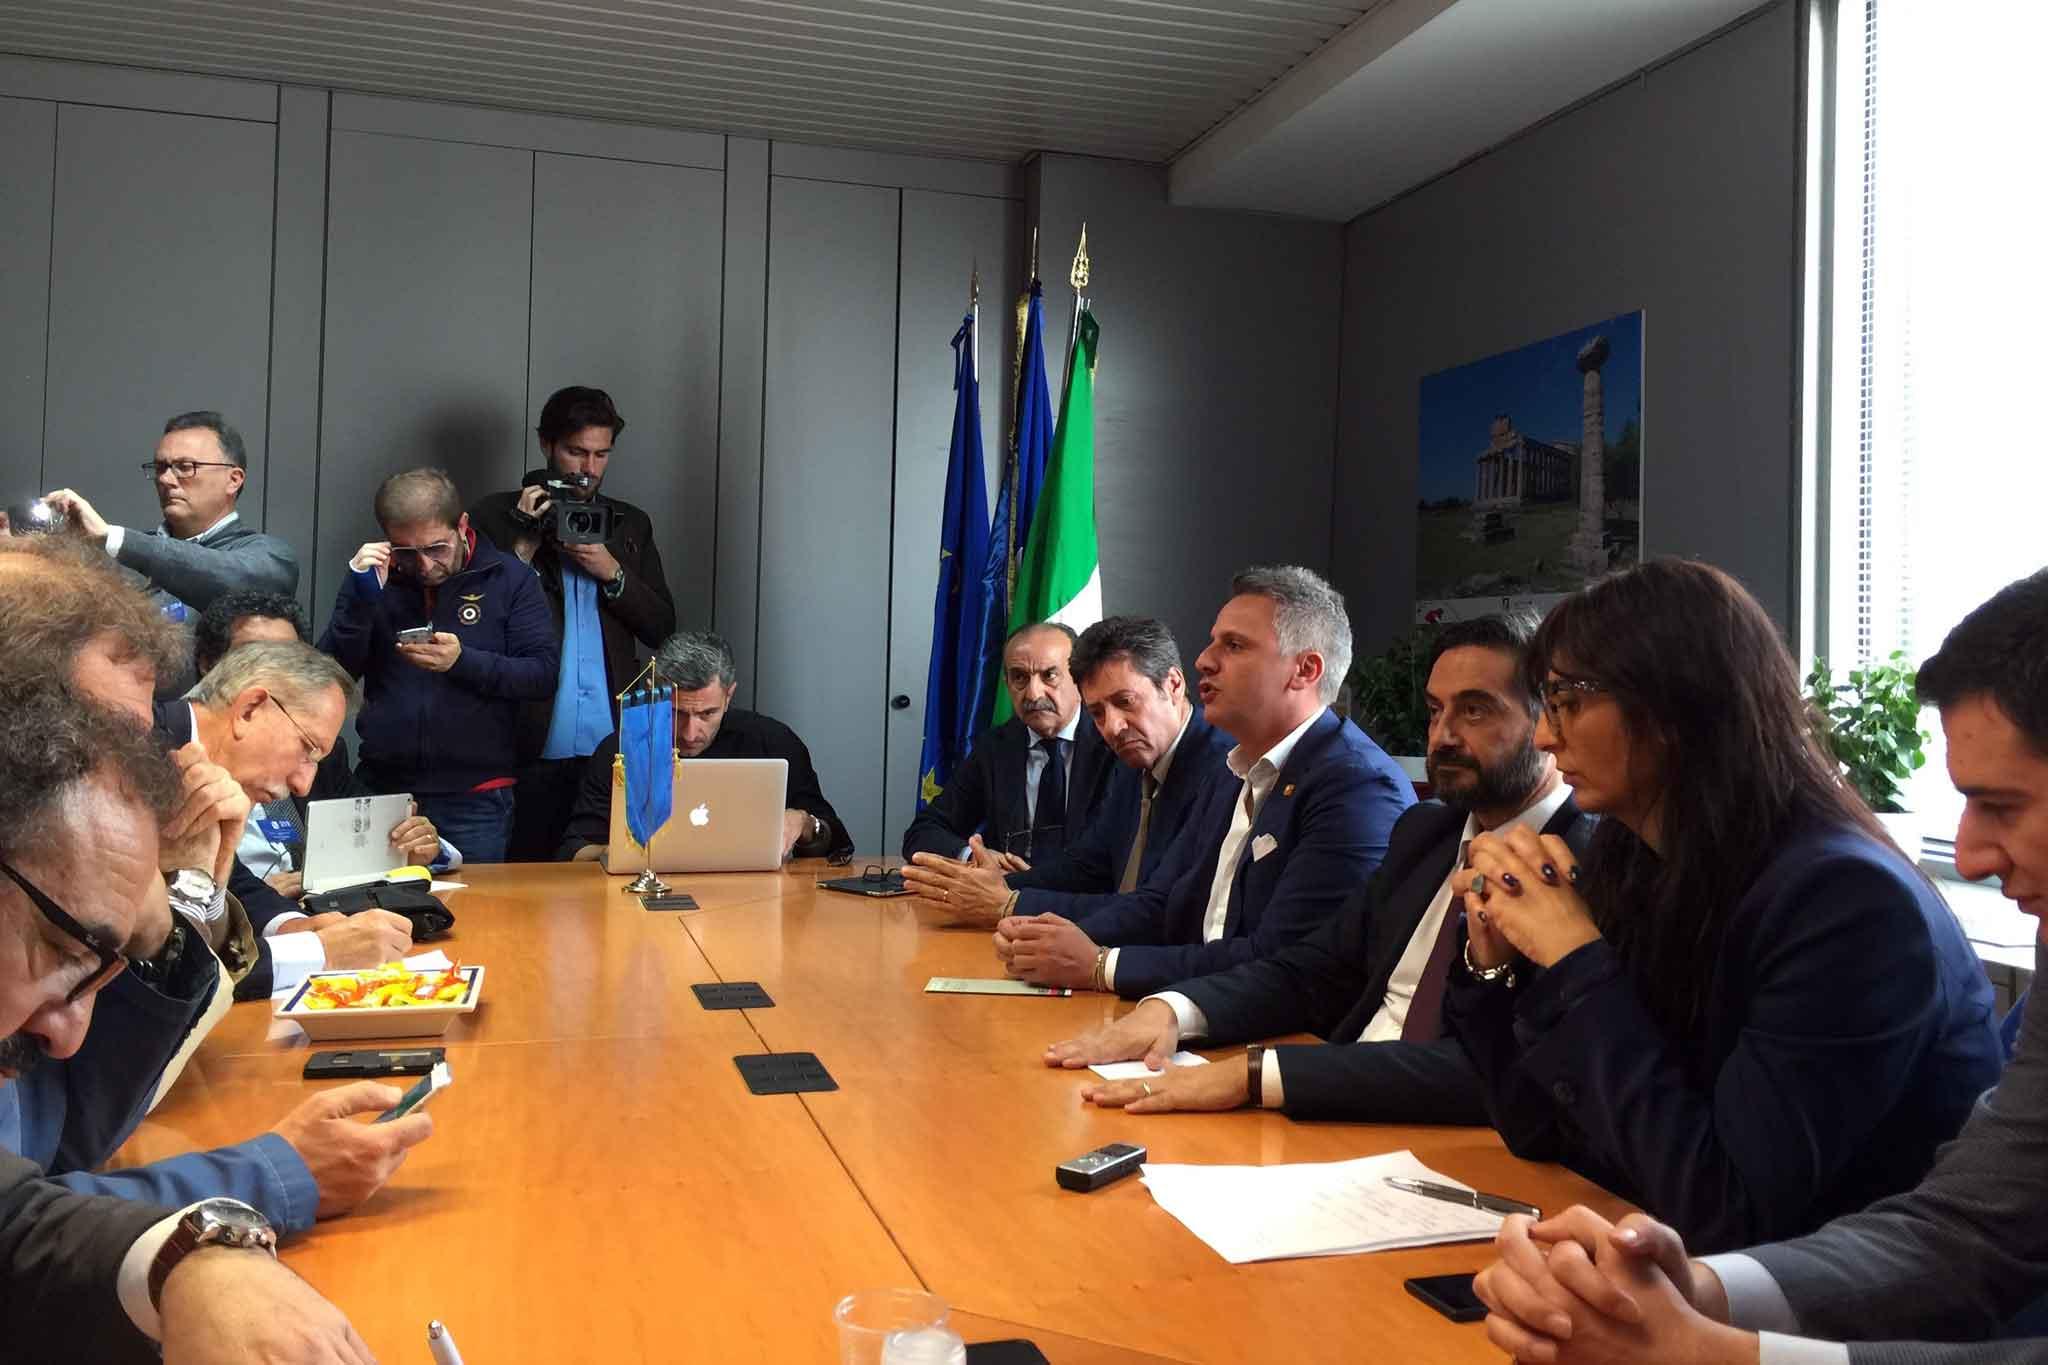 OFF Ottaviano conferenza stampa